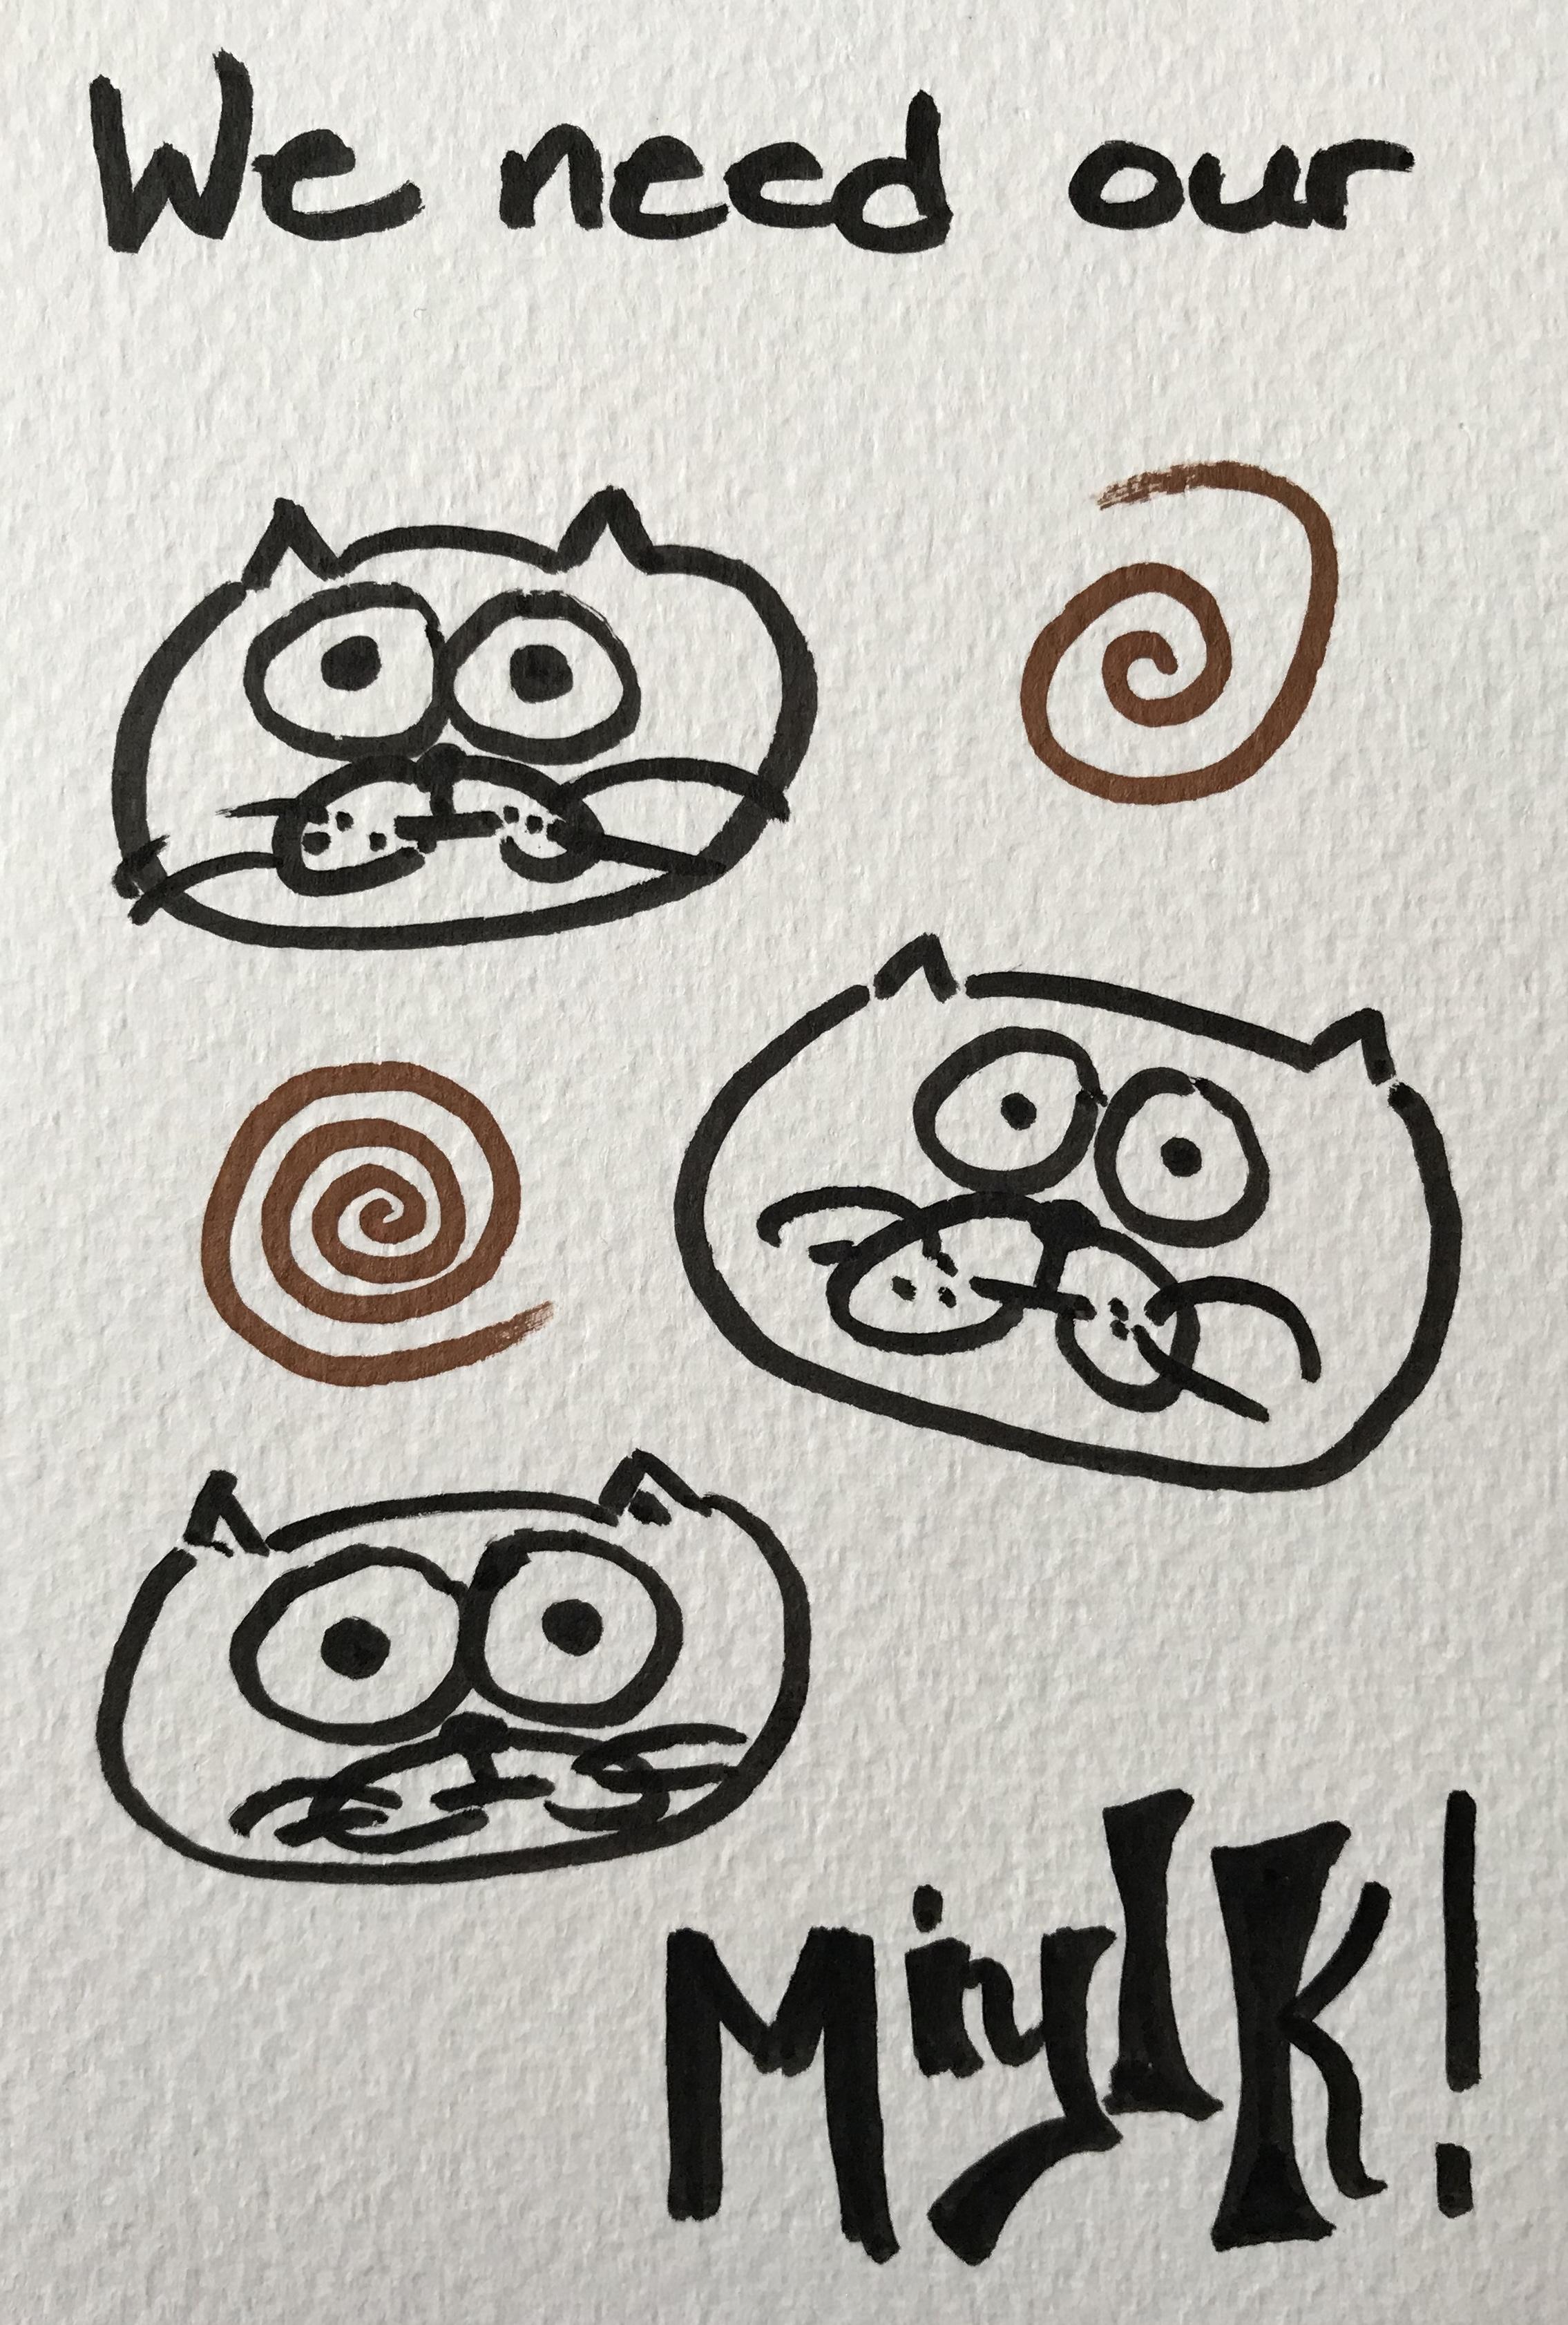 We need our miylk miylk kitten art postcard marker calligraphy typography kawaii かわいい 描く コミックス ペン オタ